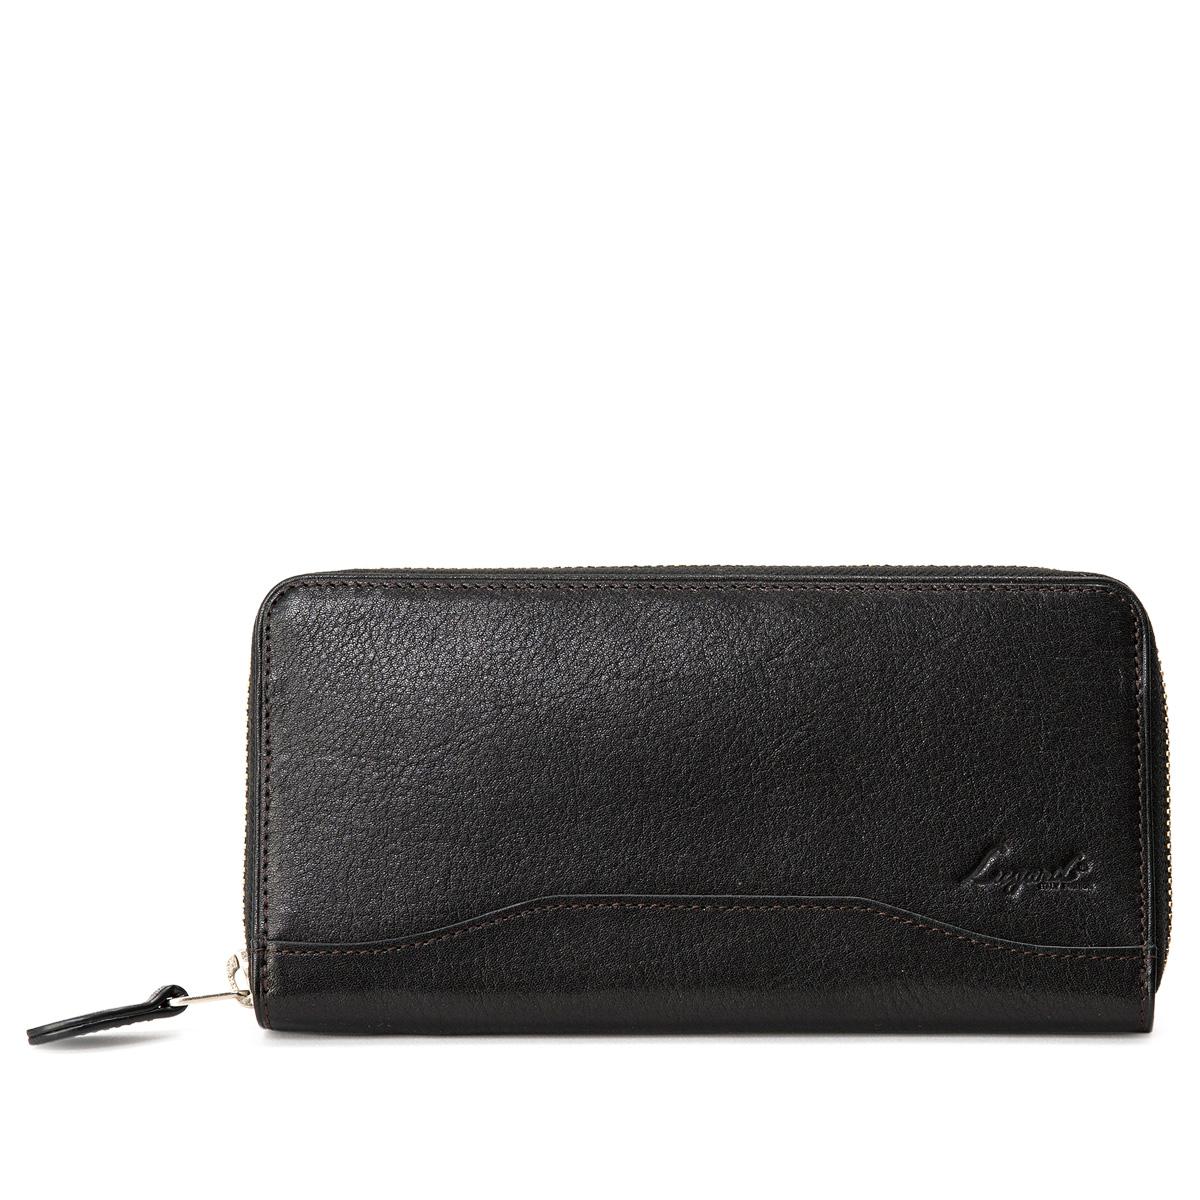 Lugard ラガード 青木鞄 財布 長財布 G3 WALLET メンズ ジースリー ブラック ネイビー ブラウン 黒 5210